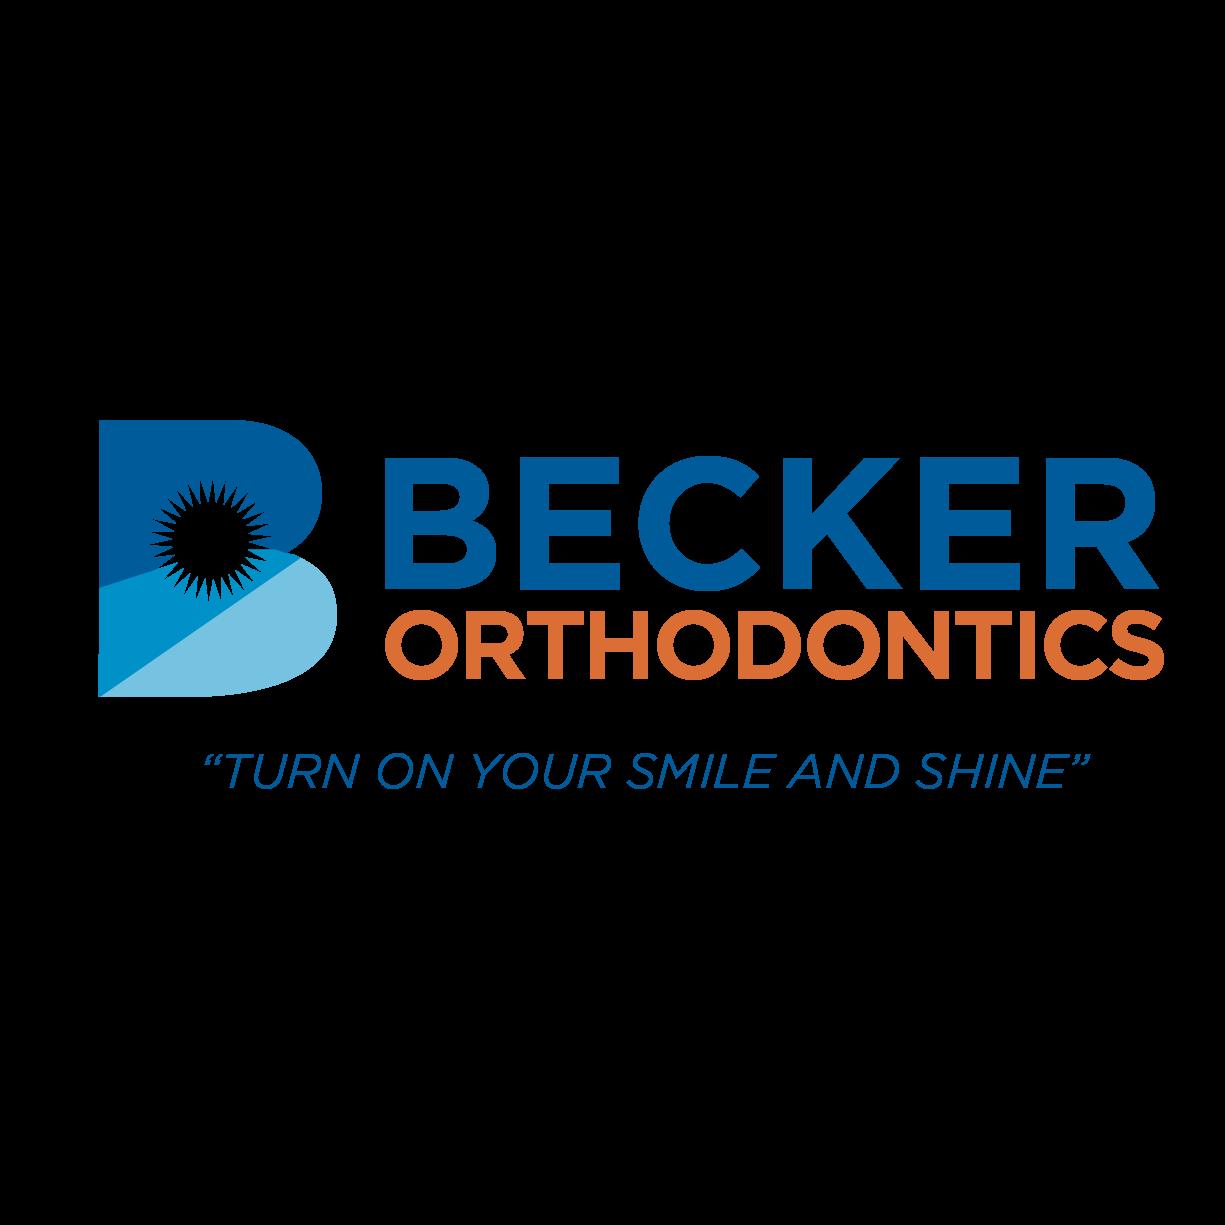 Becker Orthodontics